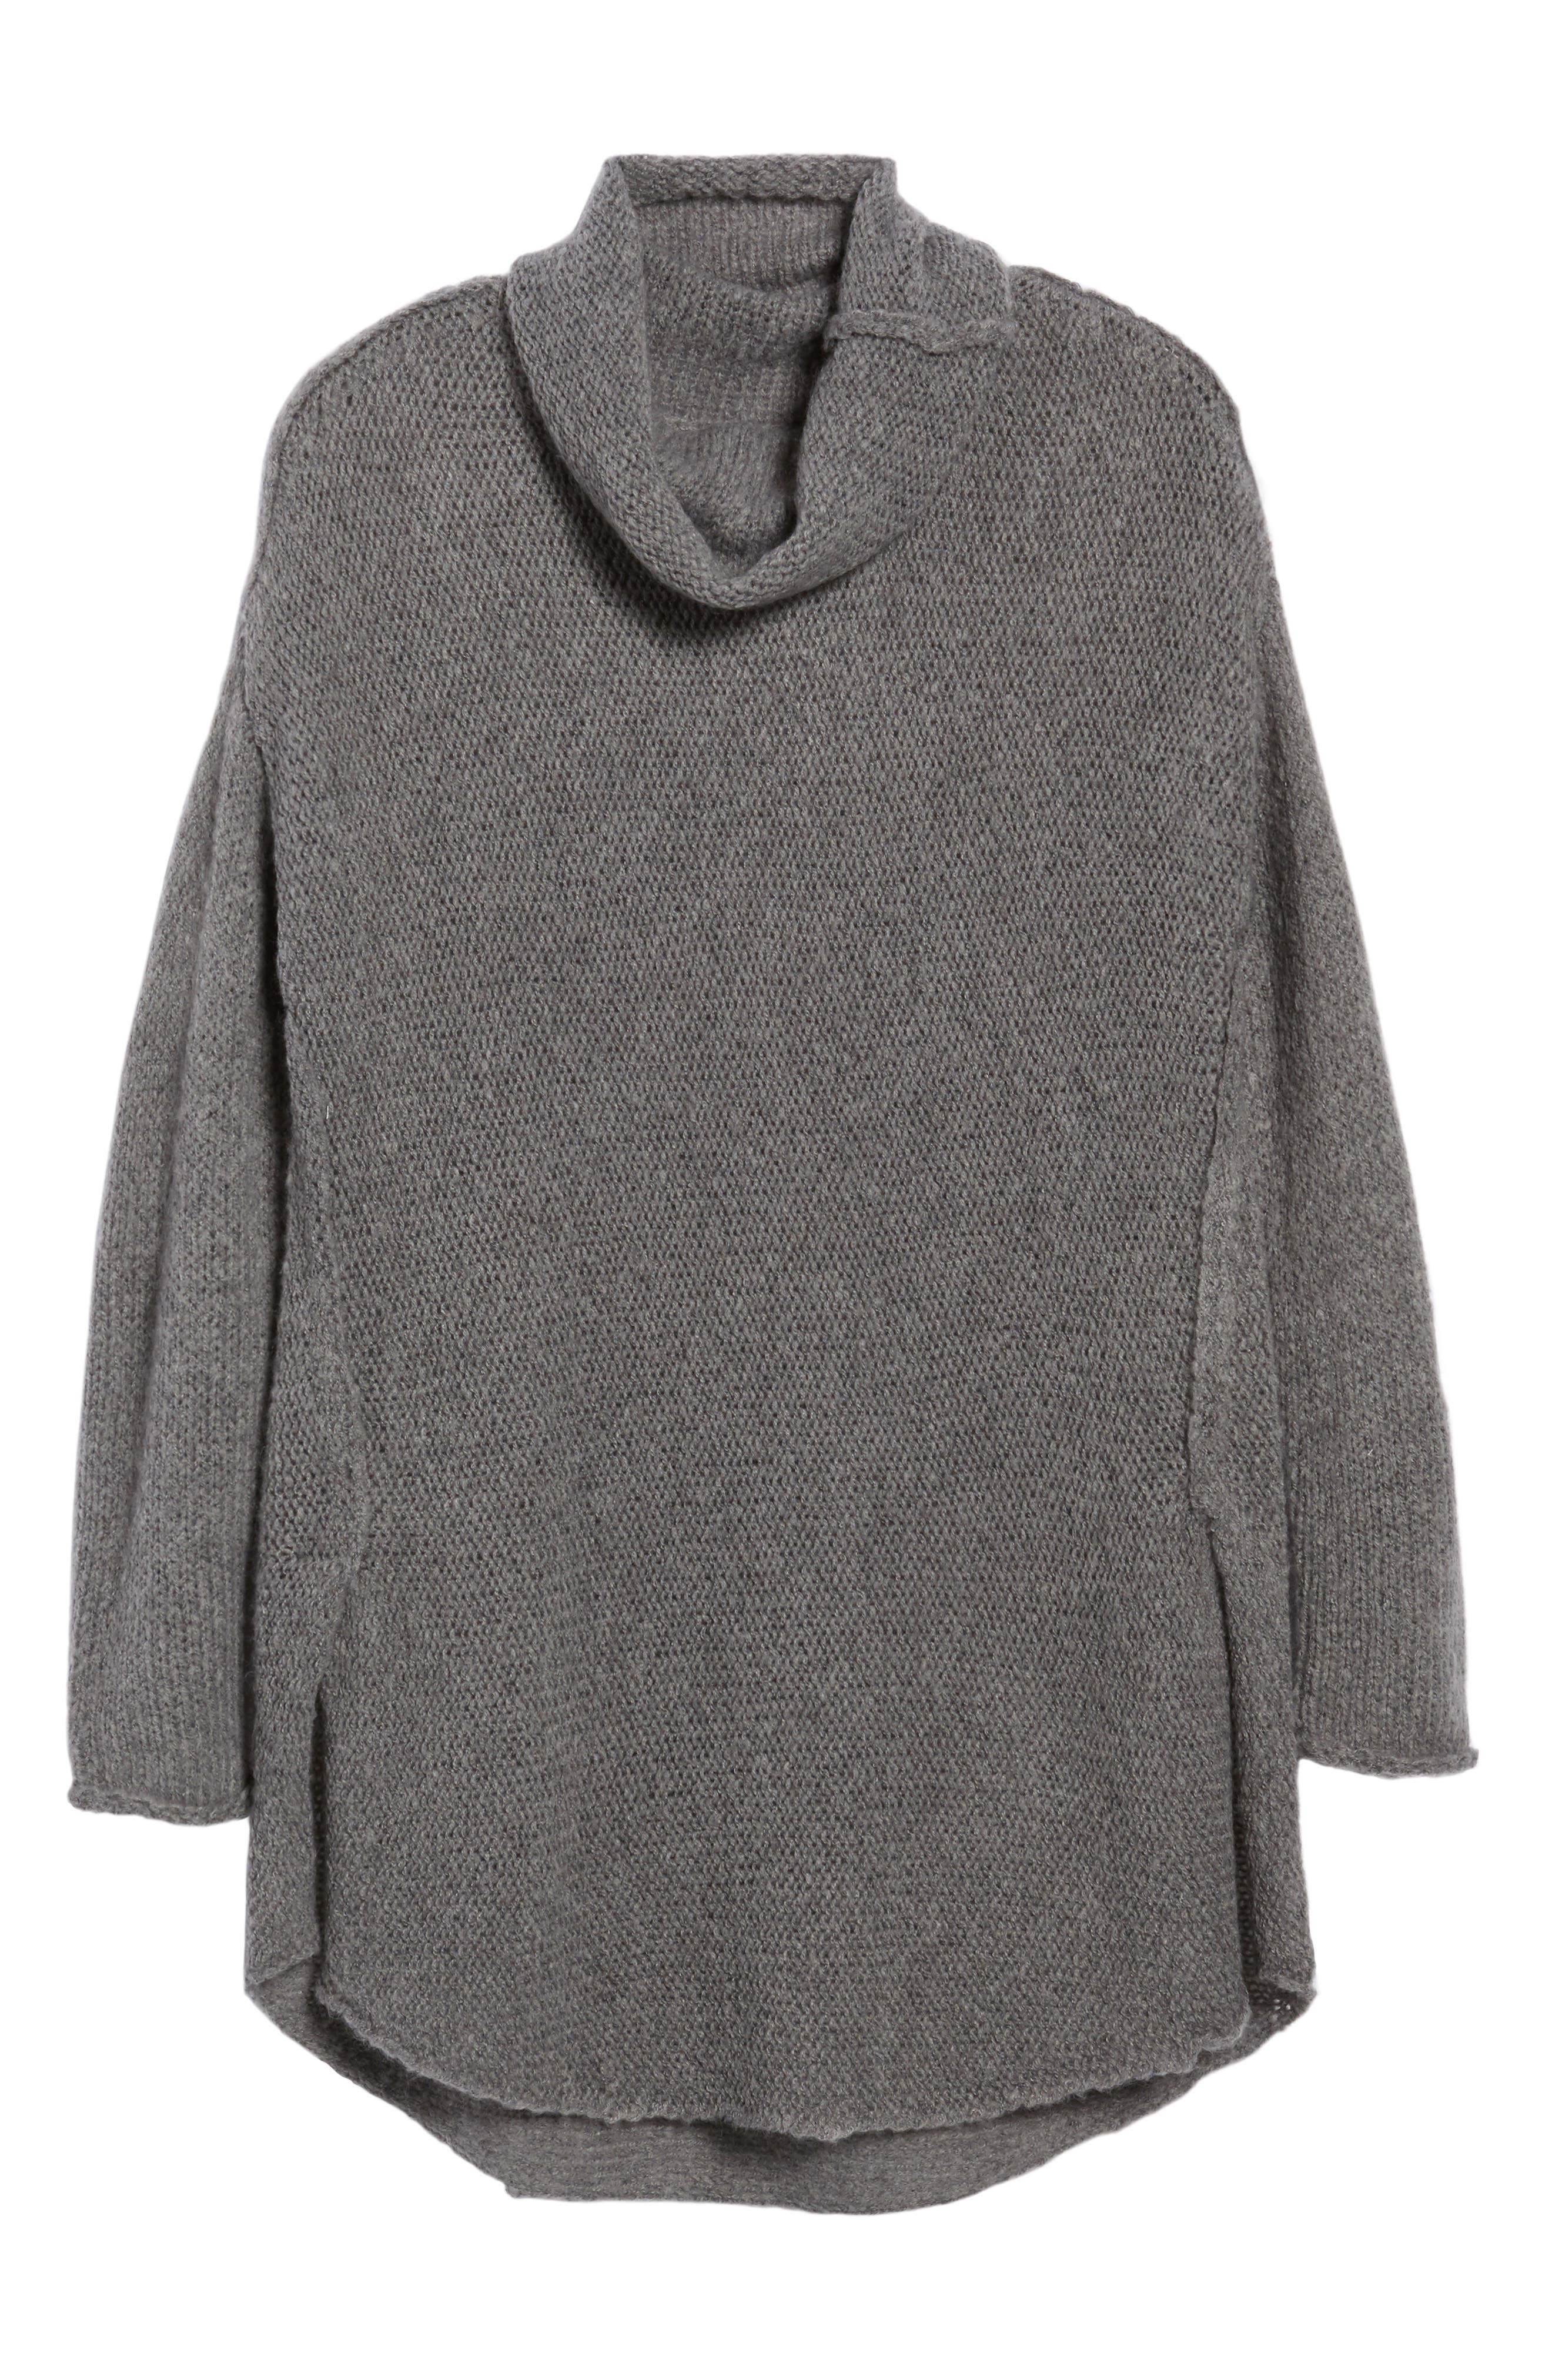 Tunic Sweater,                             Alternate thumbnail 6, color,                             GREY DARK HEATHER